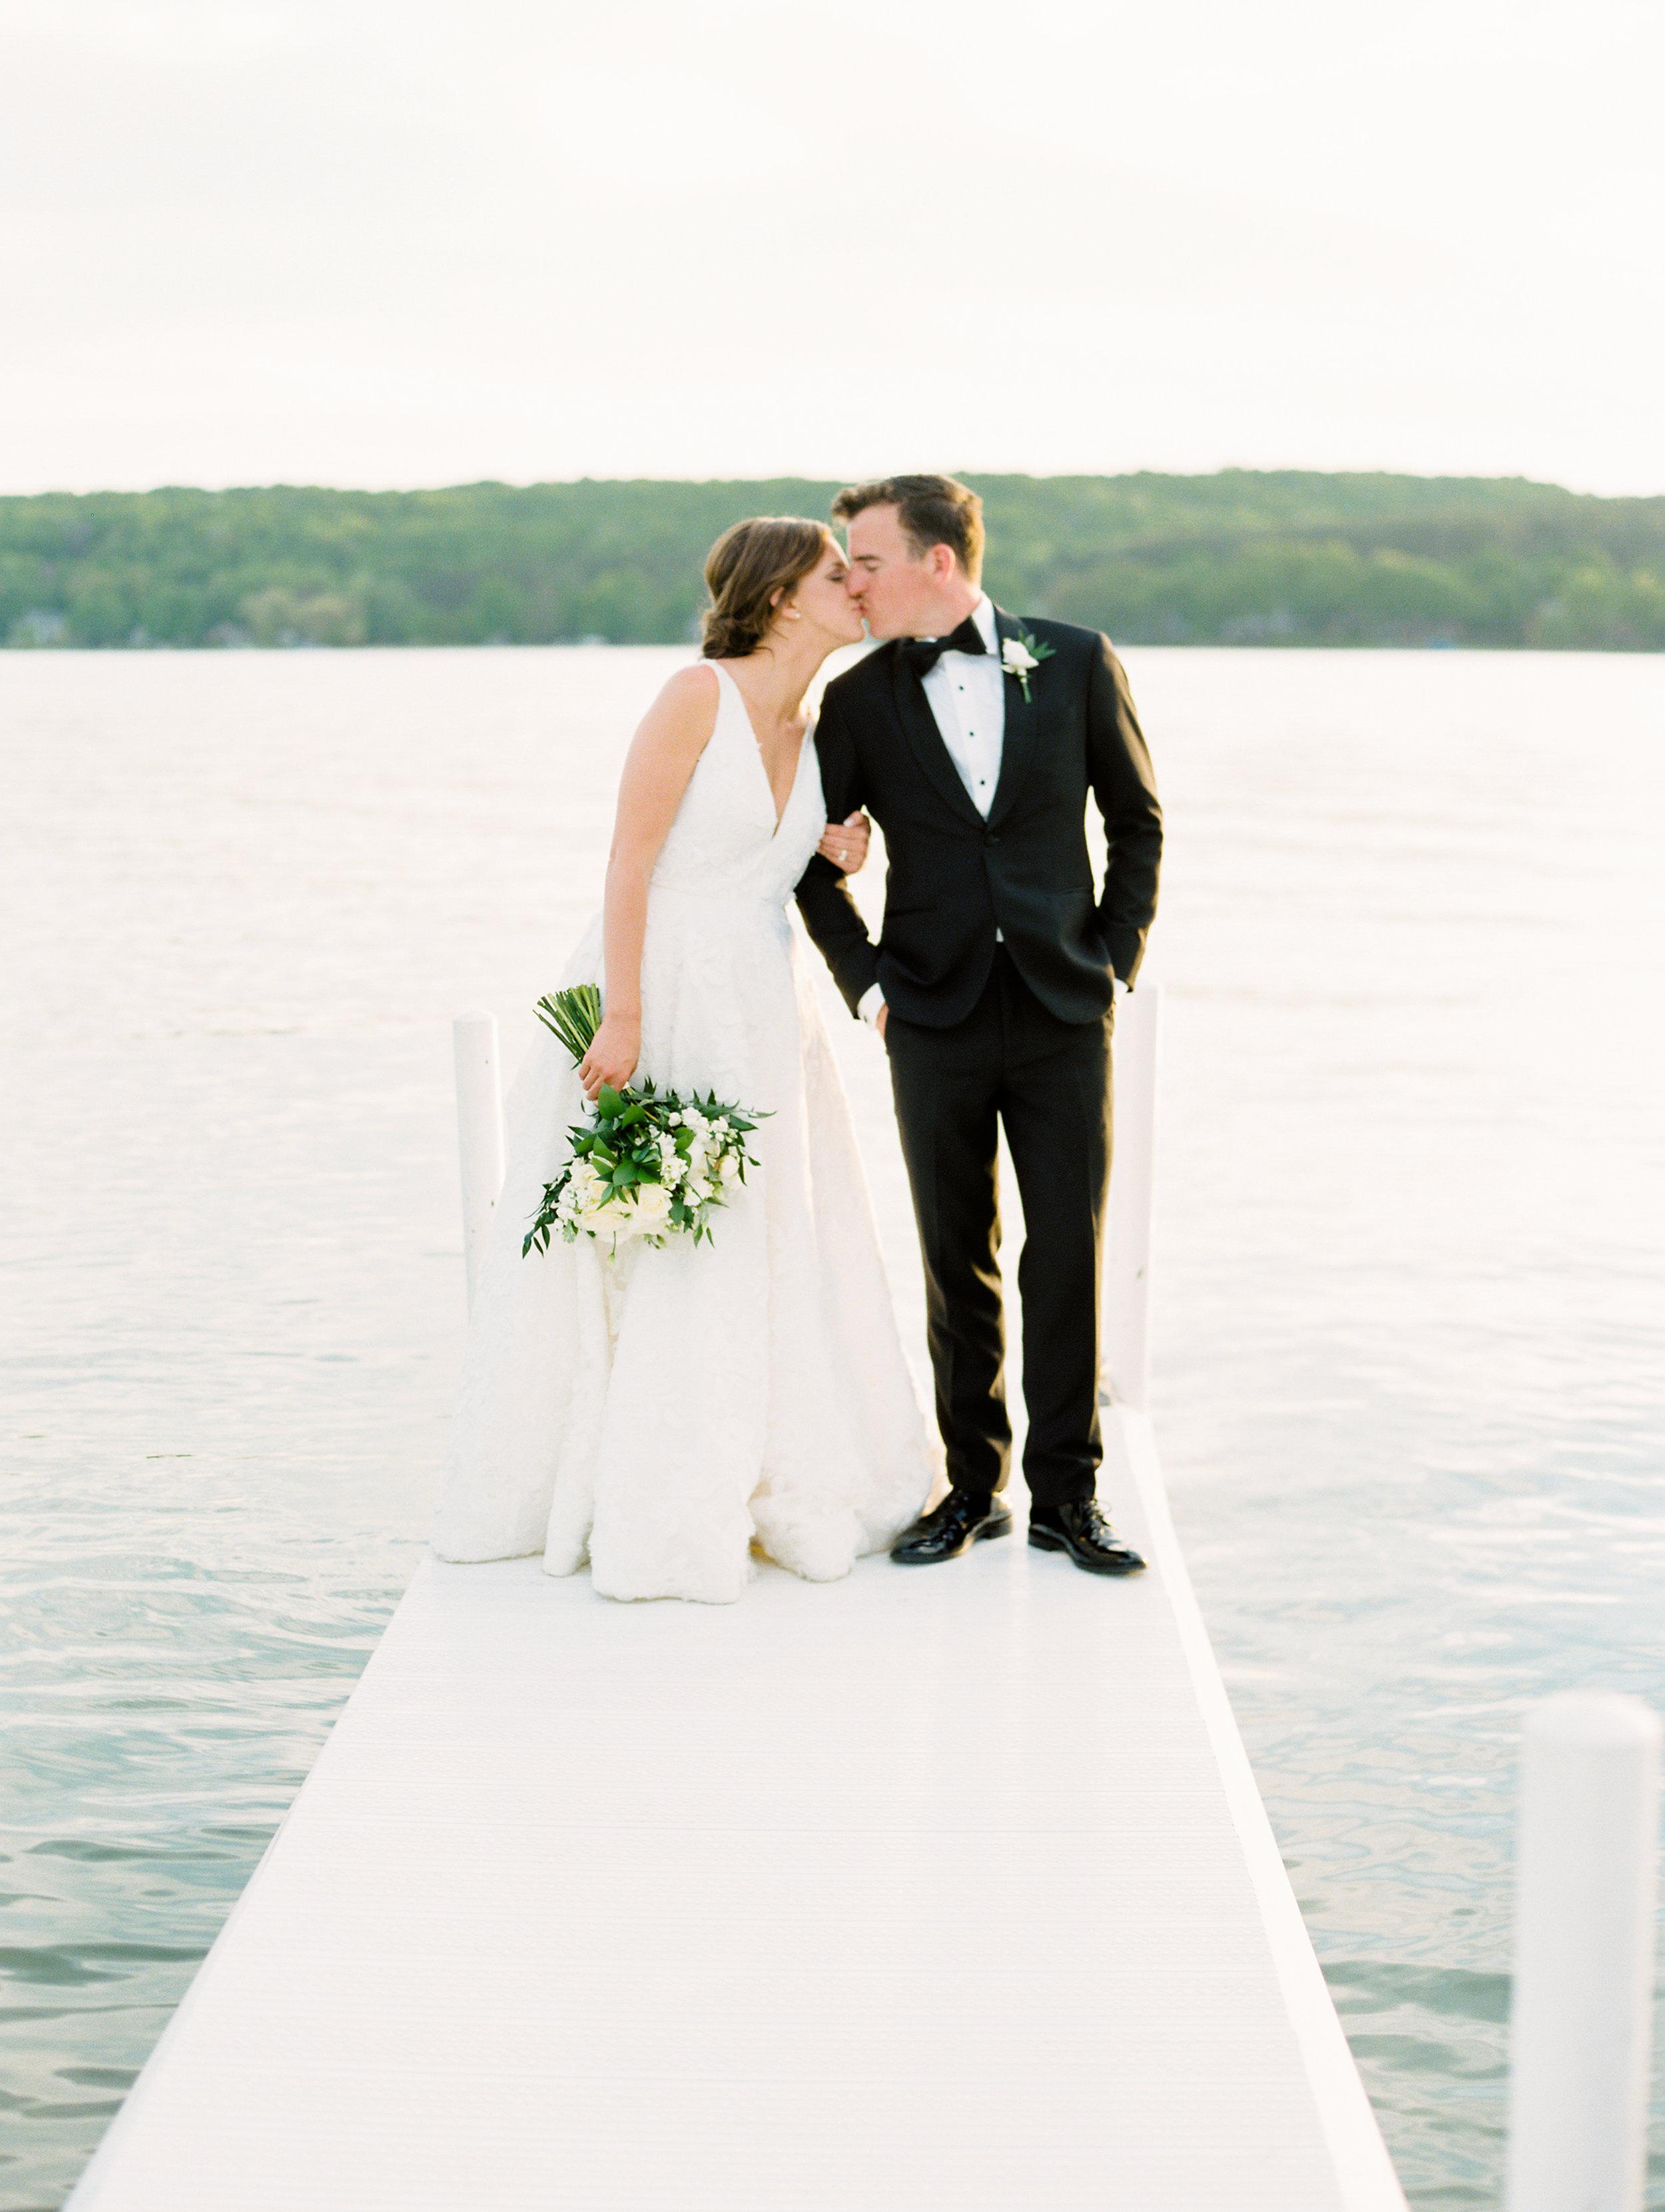 DeGuilio+Wedding+BrideGroomSunsetf-12.jpg